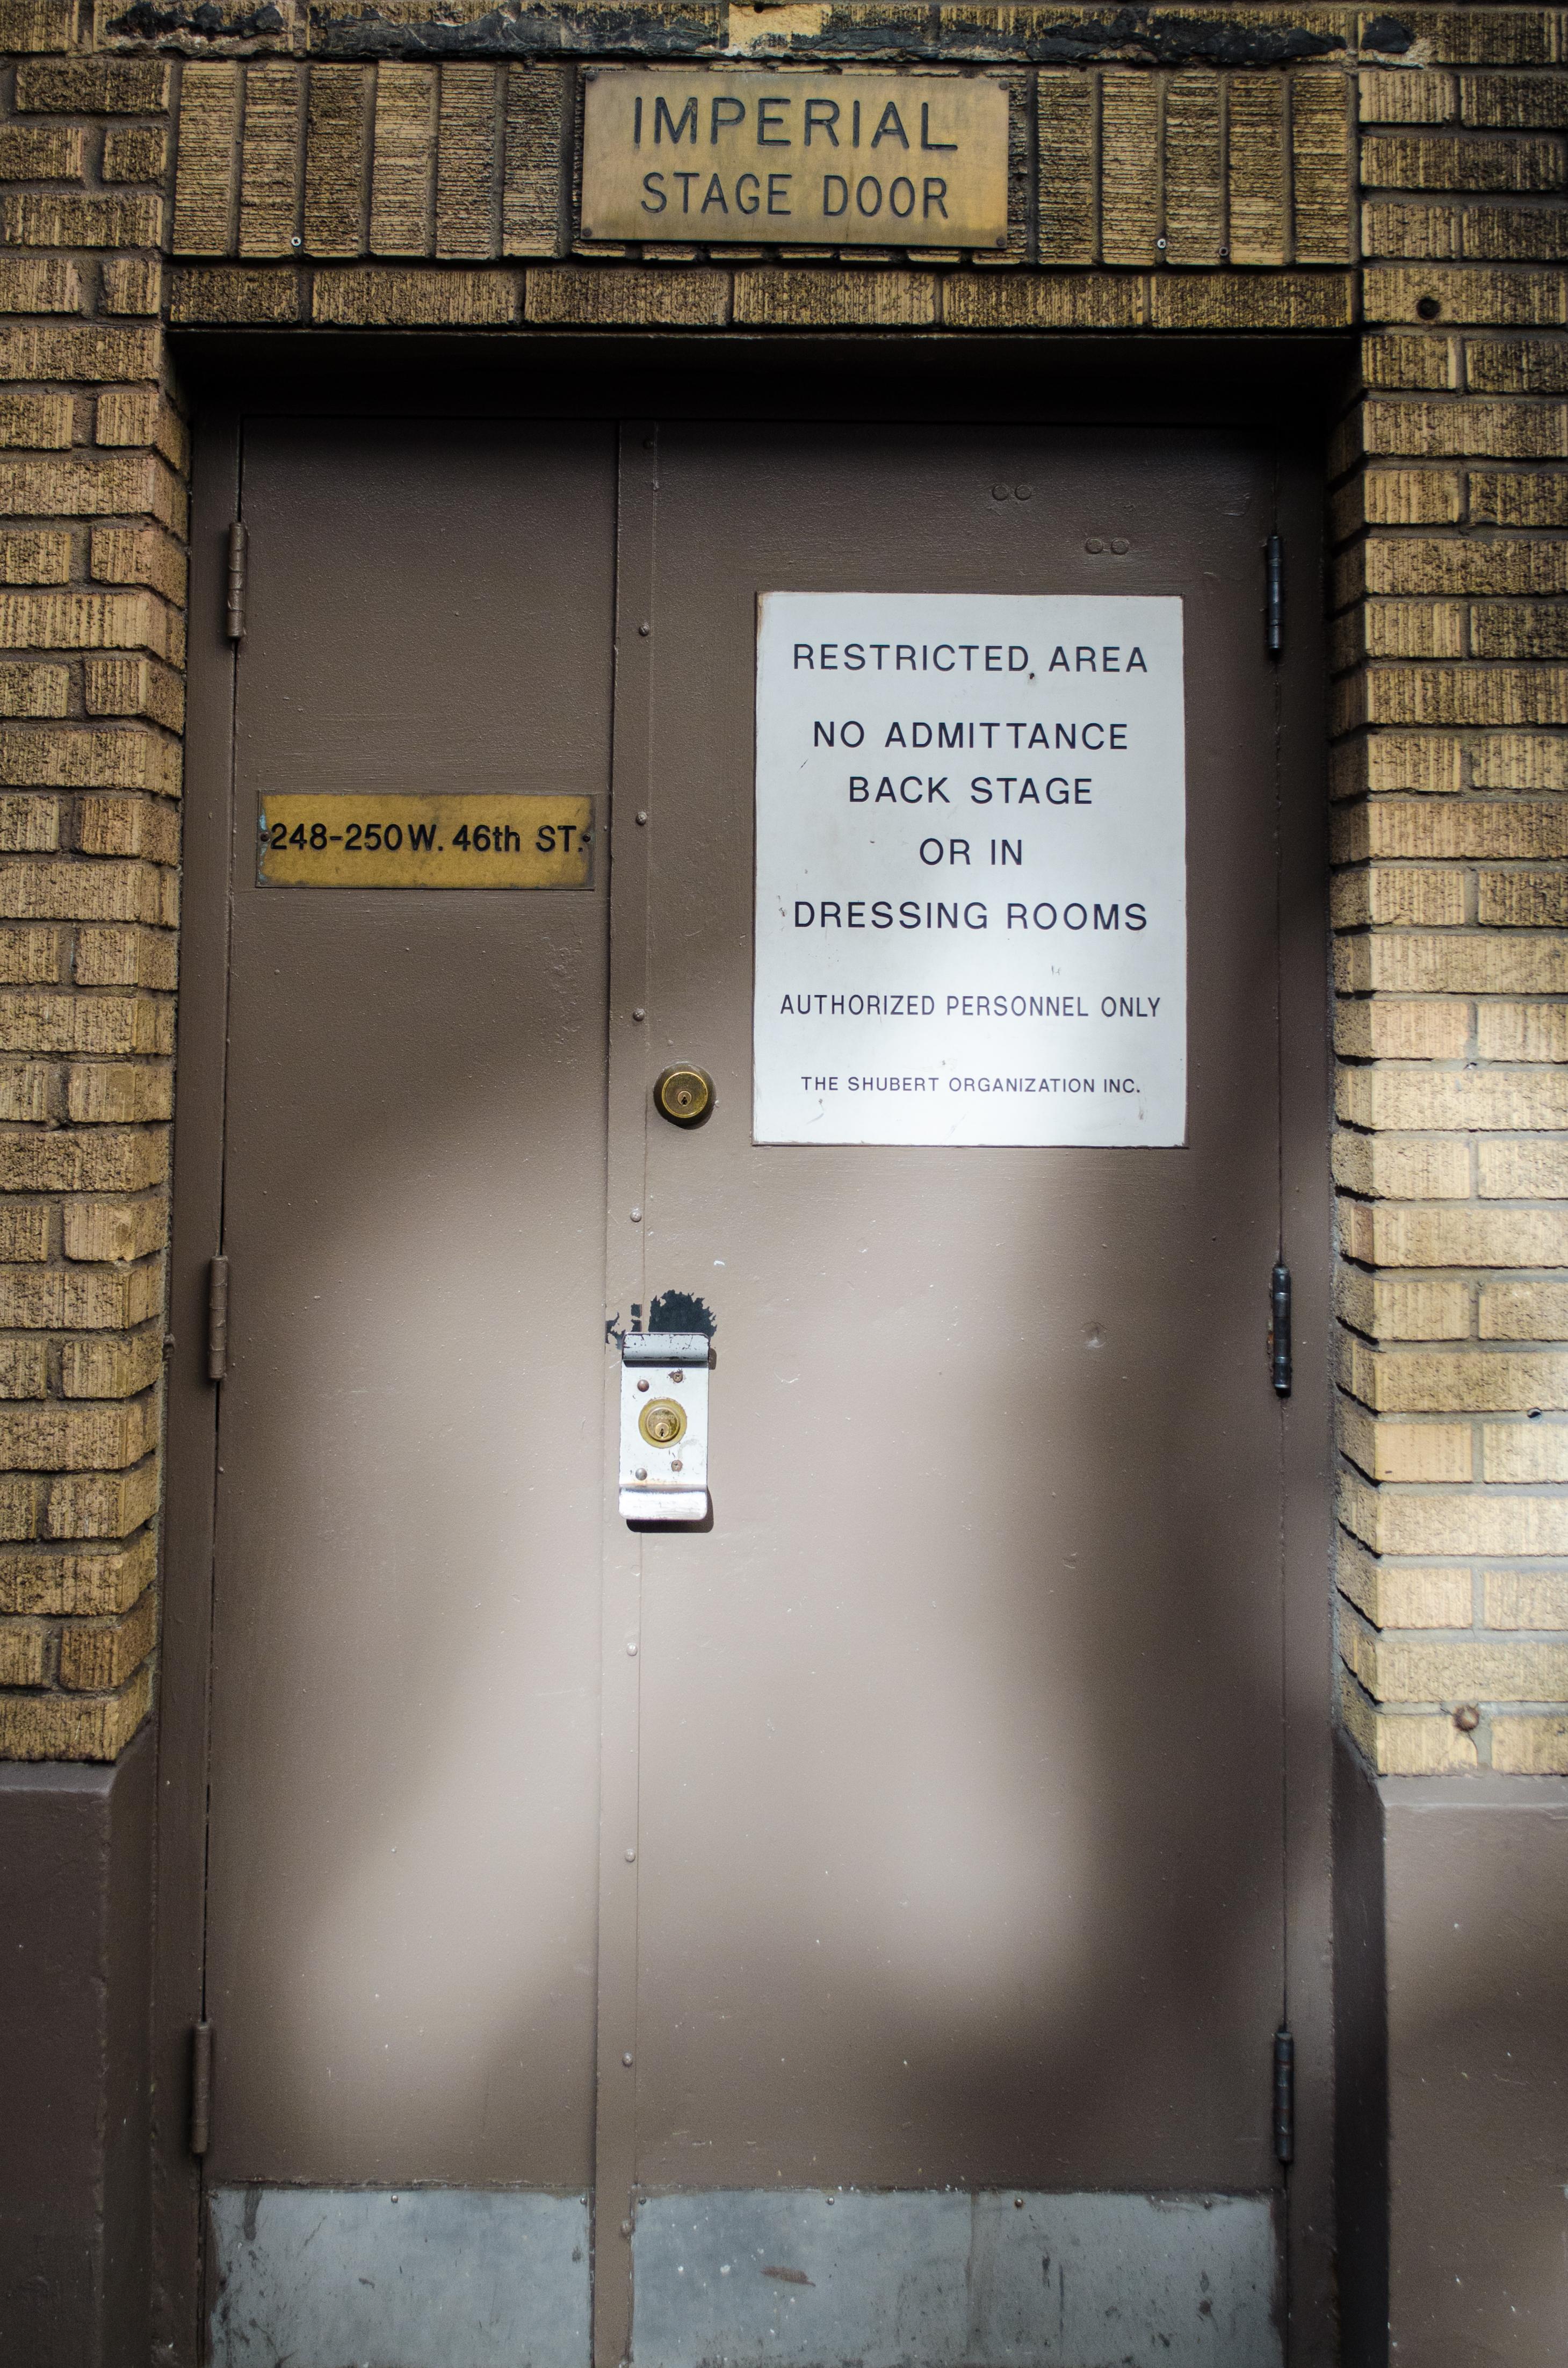 Imperial Theatre (Broadway) - Theater Information Stage Door